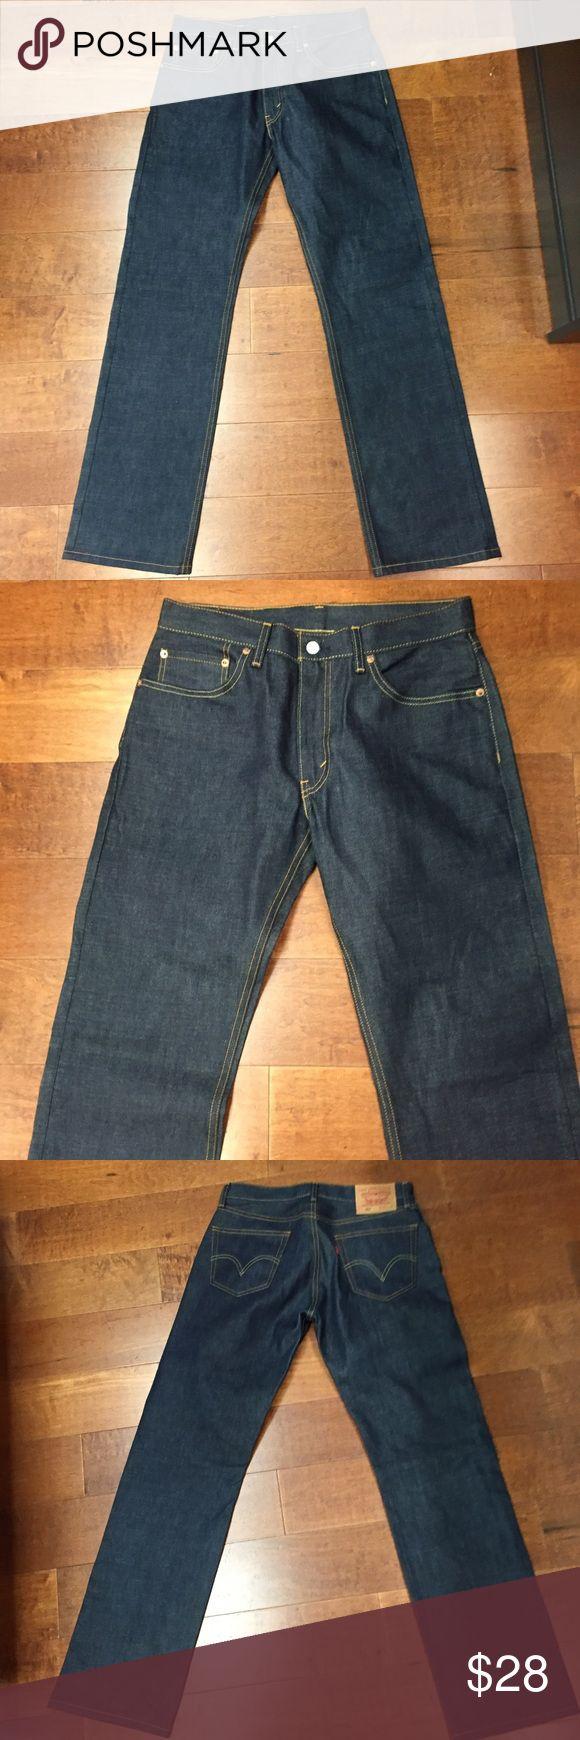 "Levis 505 NEW wot size W31 L32 NEW without tags original Levis 505 jeans W31 L31 rise 10"" bell 8.75"" Levi's Jeans Boot Cut"